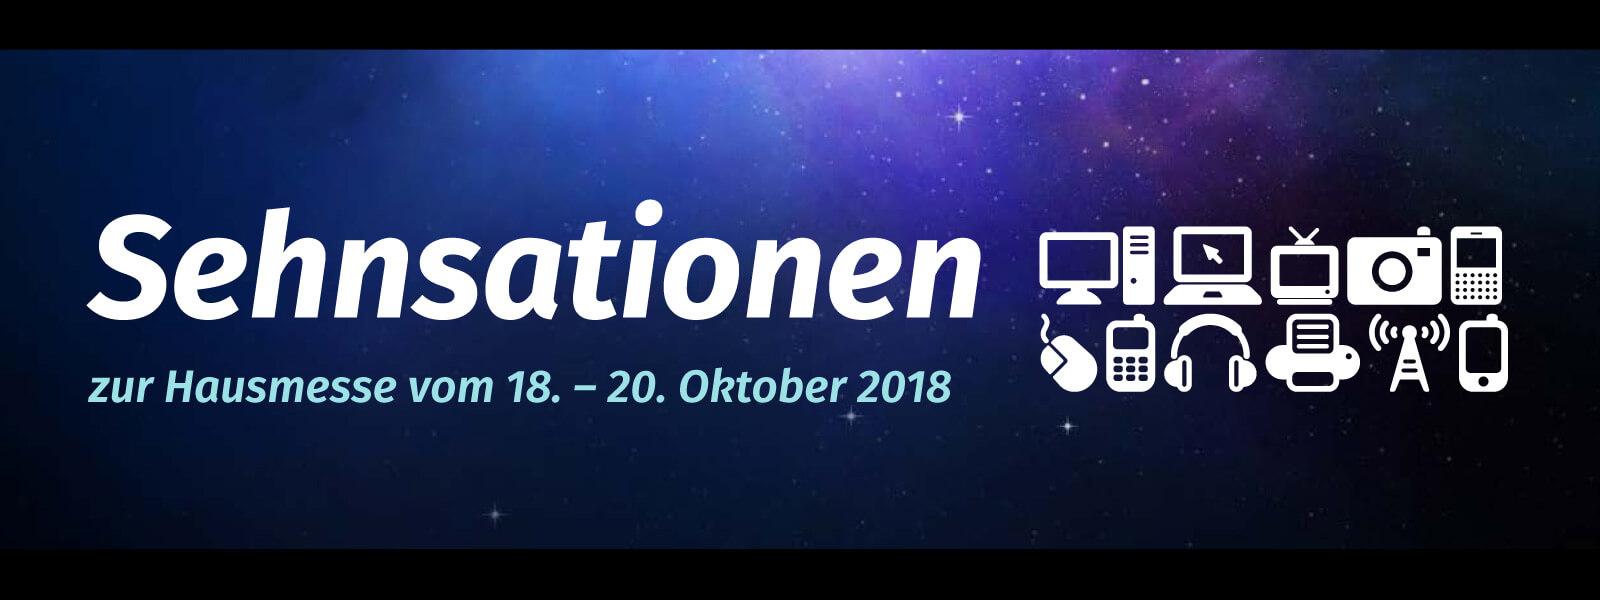 hifiboehm Plauen Hausmesse 2018